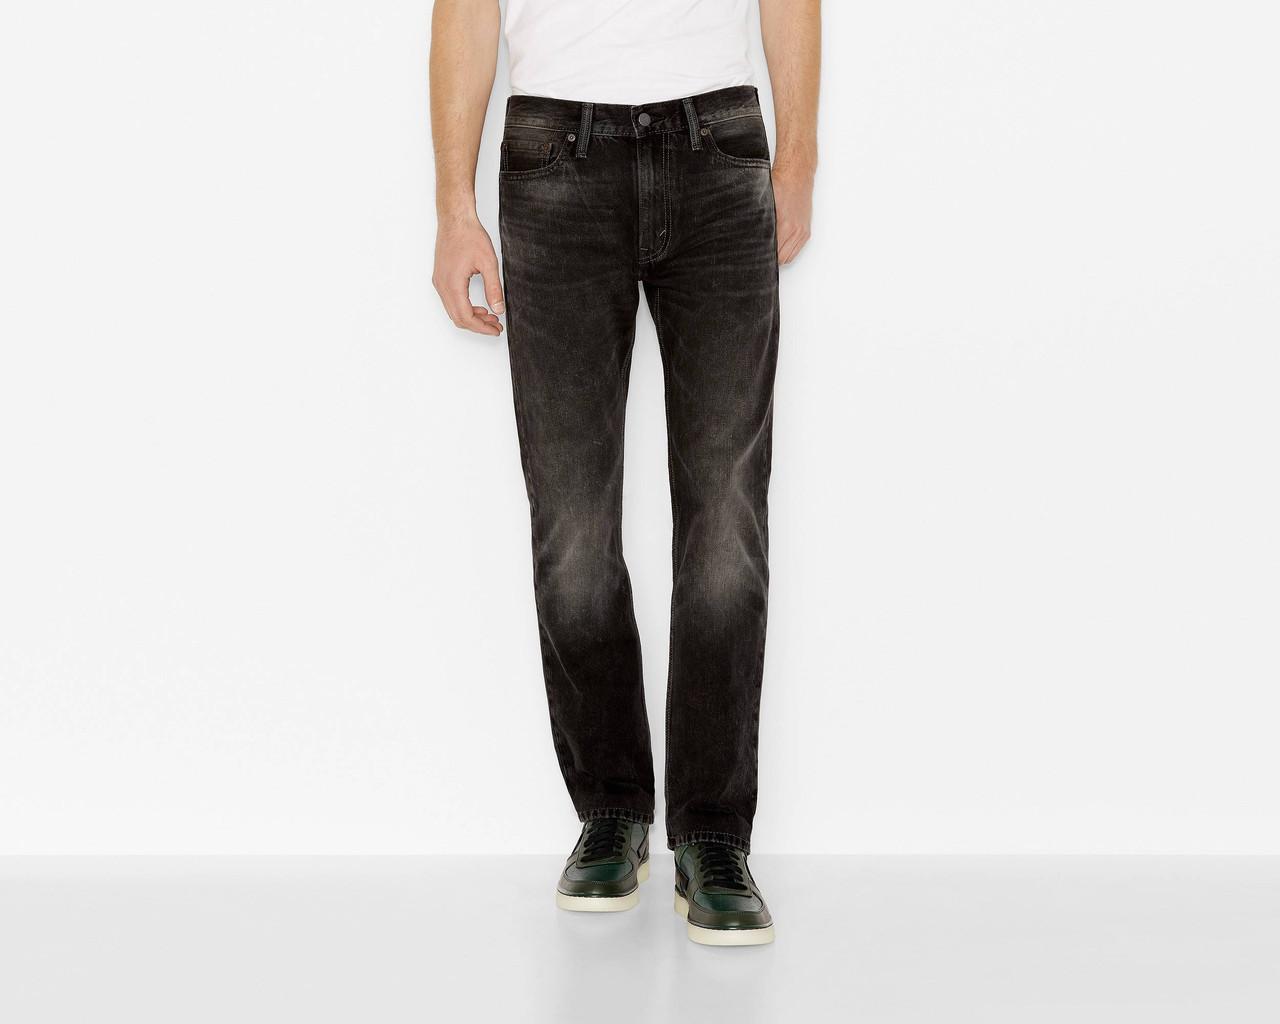 Джинсы Levi's 513 Slim Fit Straight Leg, Mad River, 32W34L, 085130594